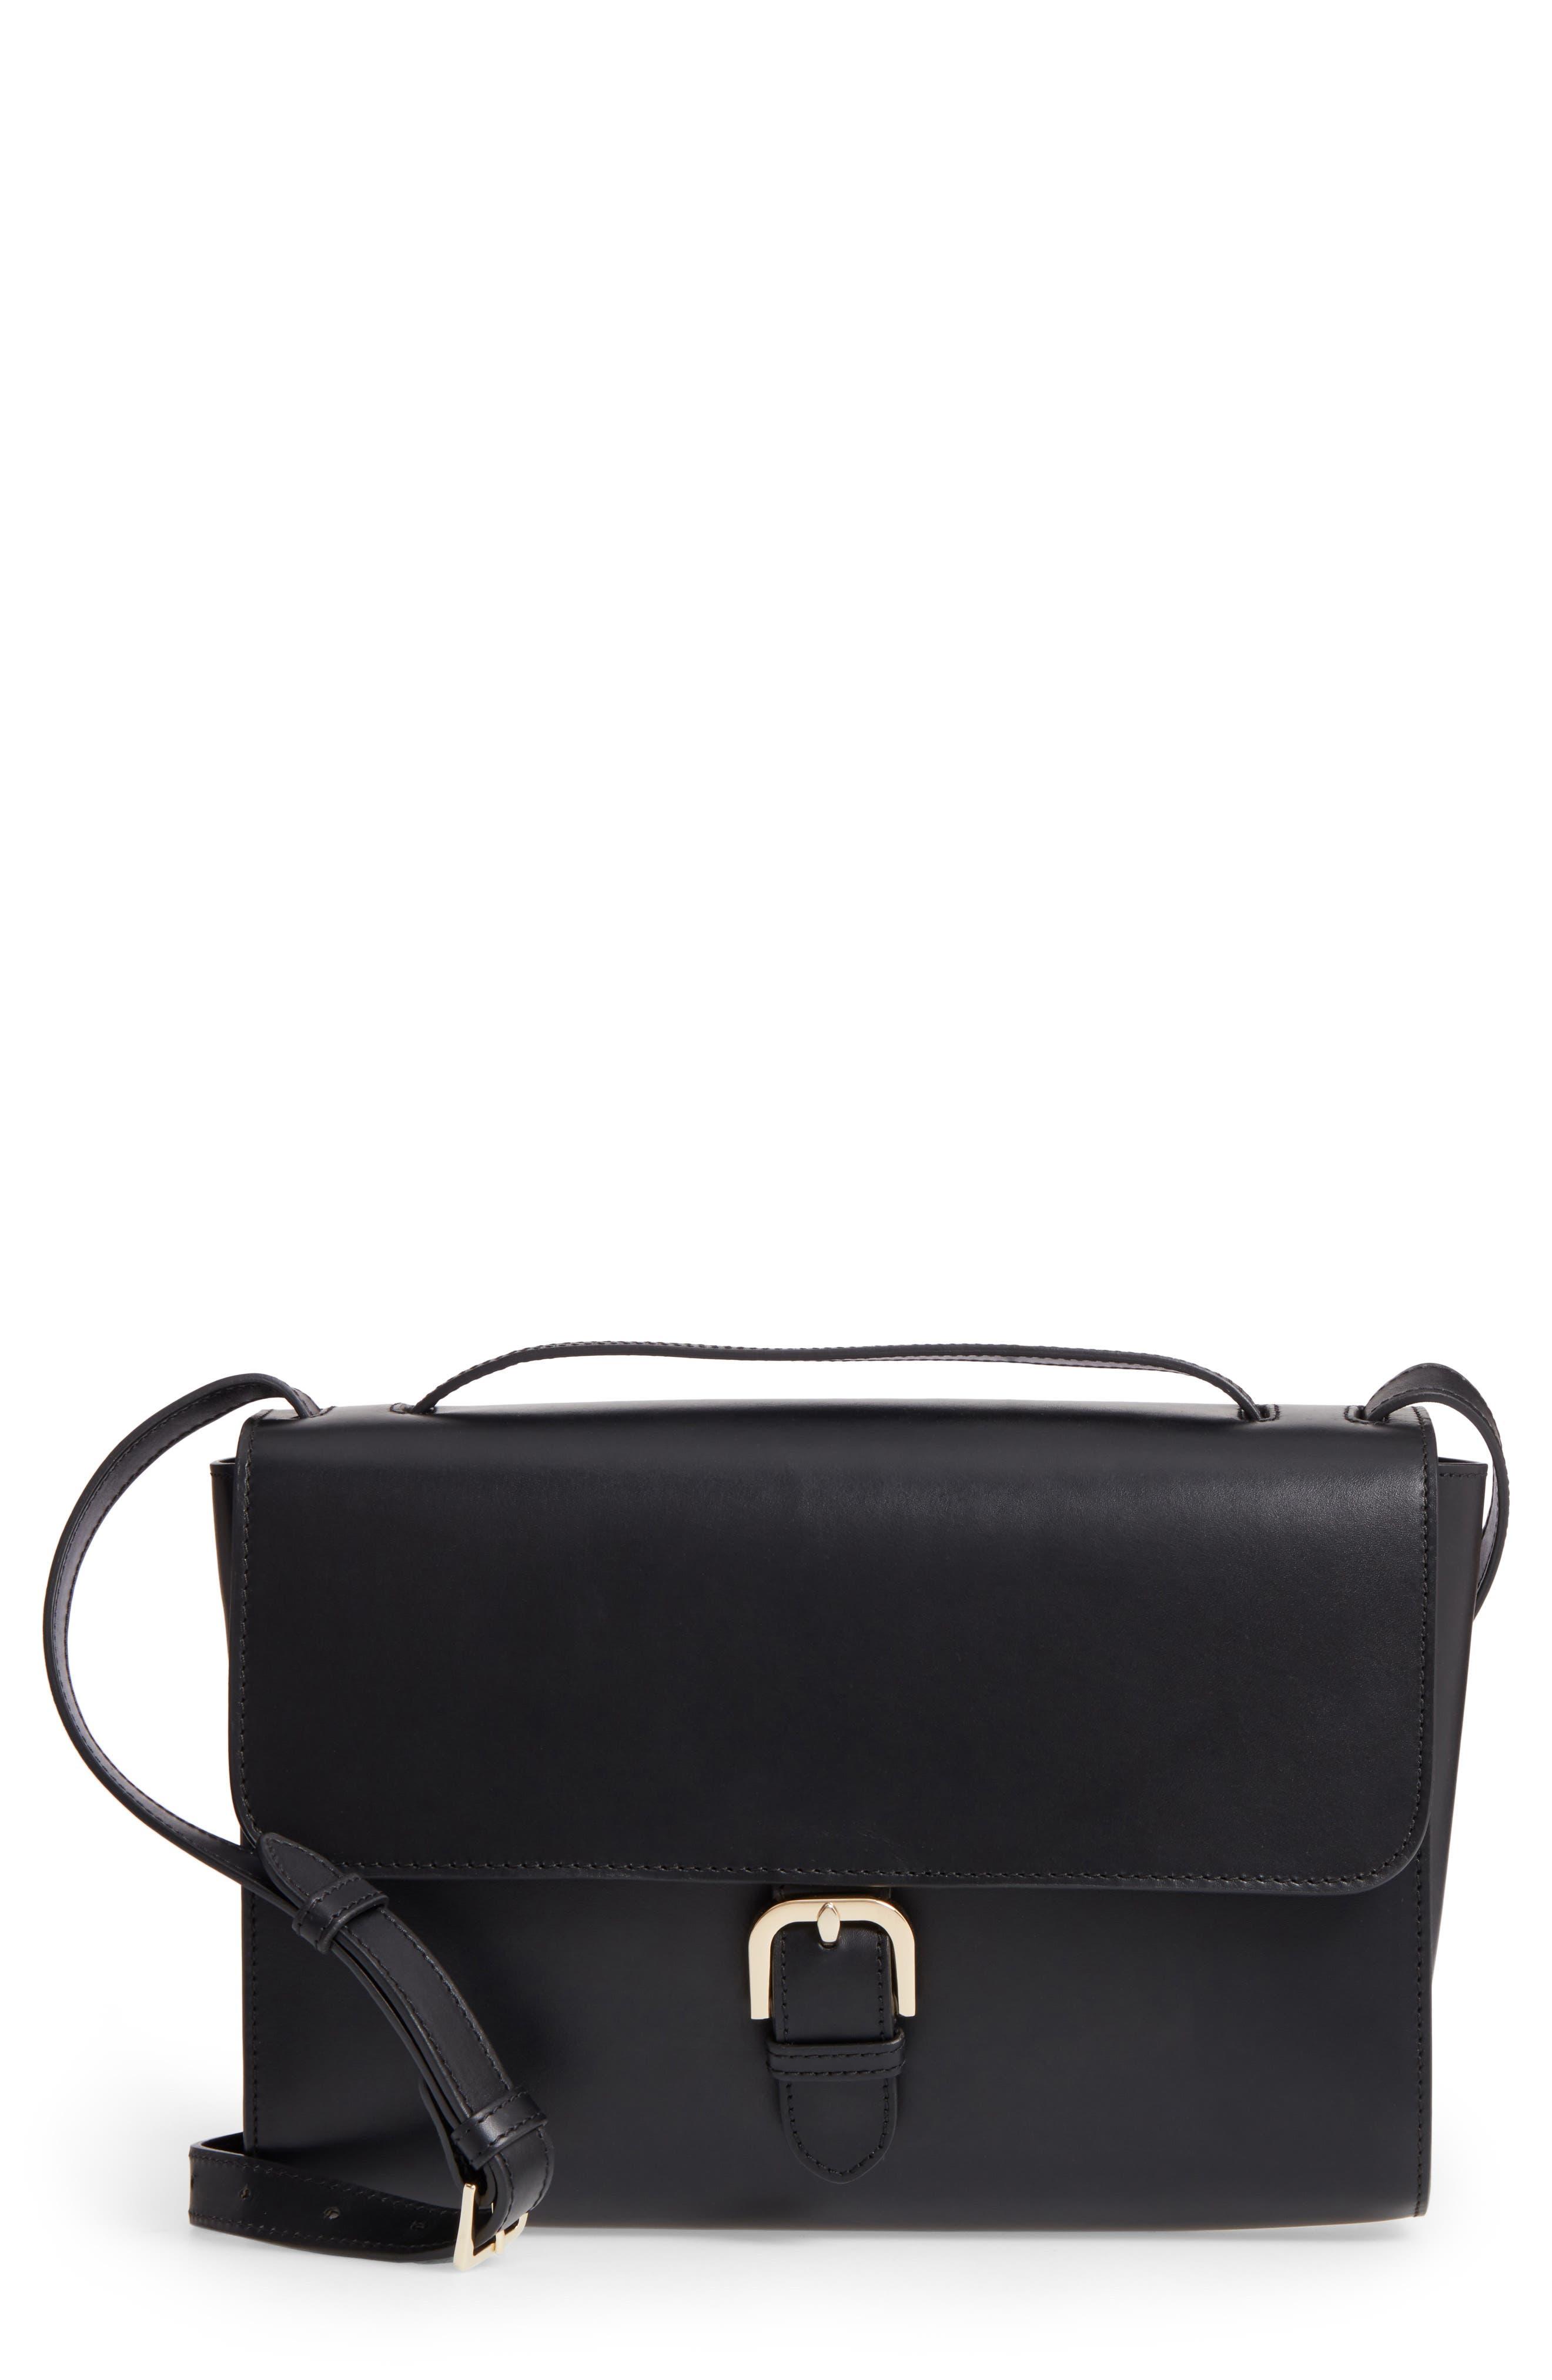 Katy Calfskin Leather Messenger Bag,                             Main thumbnail 1, color,                             Noir